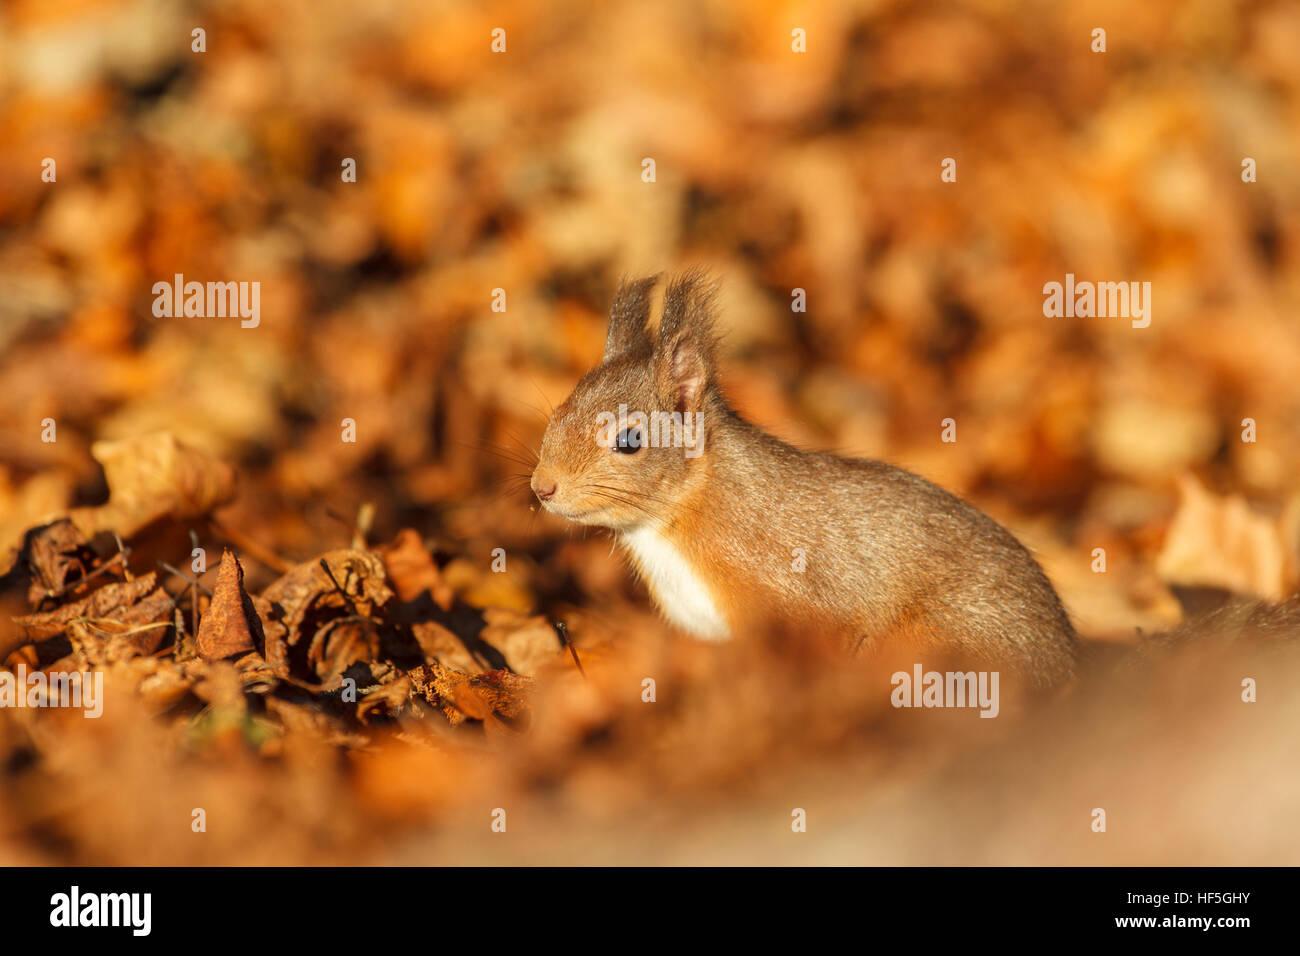 Eurasian Red squirrel (Sciurus vulgaris) feeding in autumnal setting. Highland.Scotland.Great Britain. Stock Photo